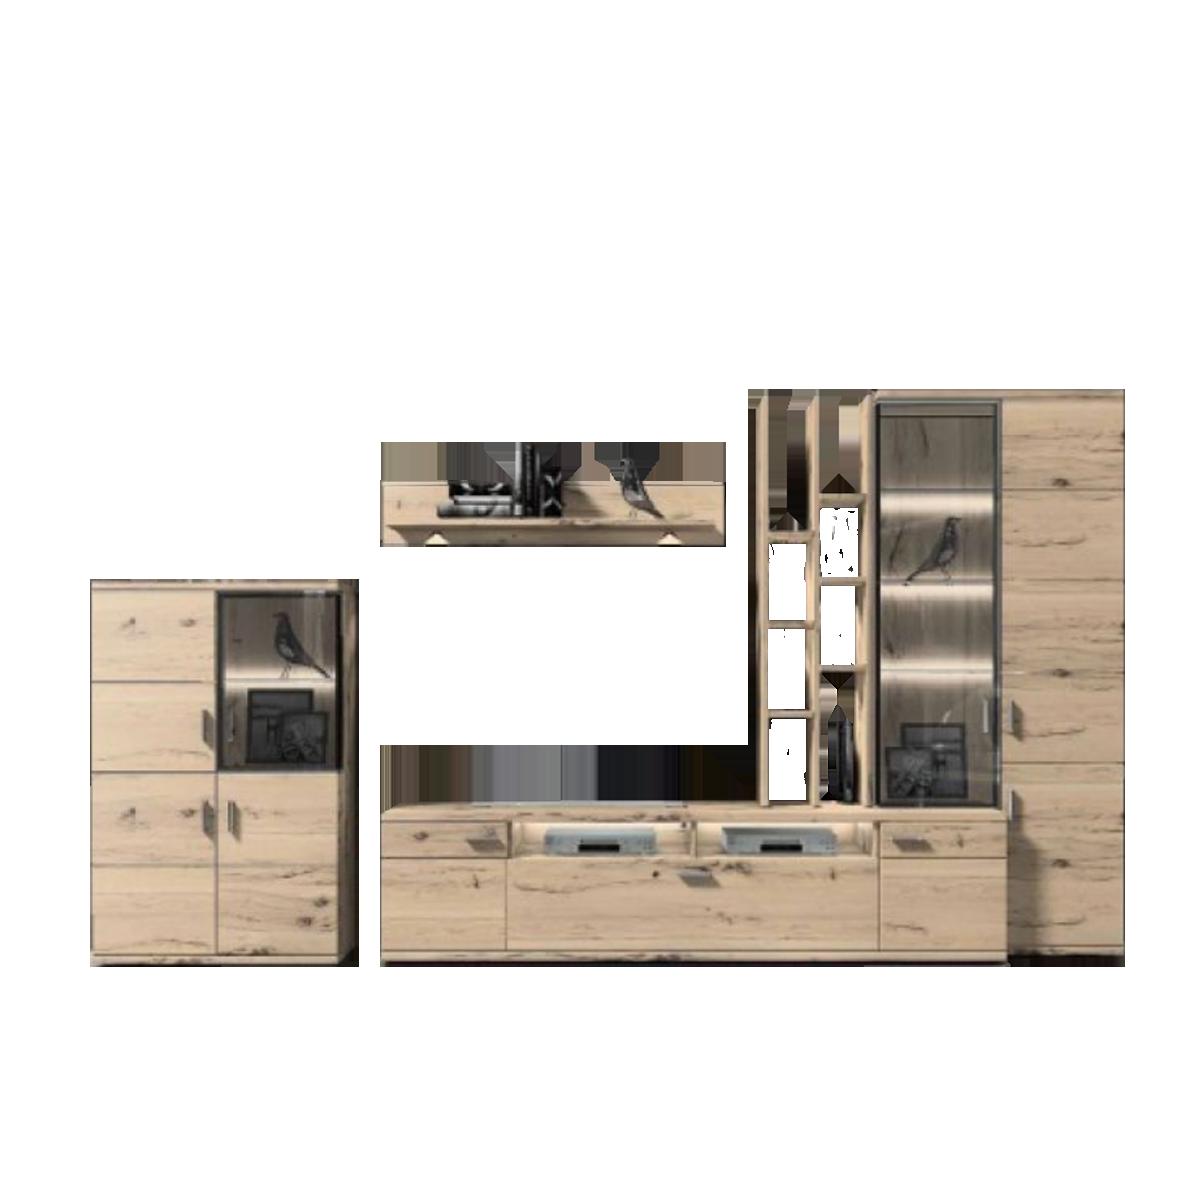 Ideal Möbel Wohnkombination Fronten Massivholz Mit Beleuchtung